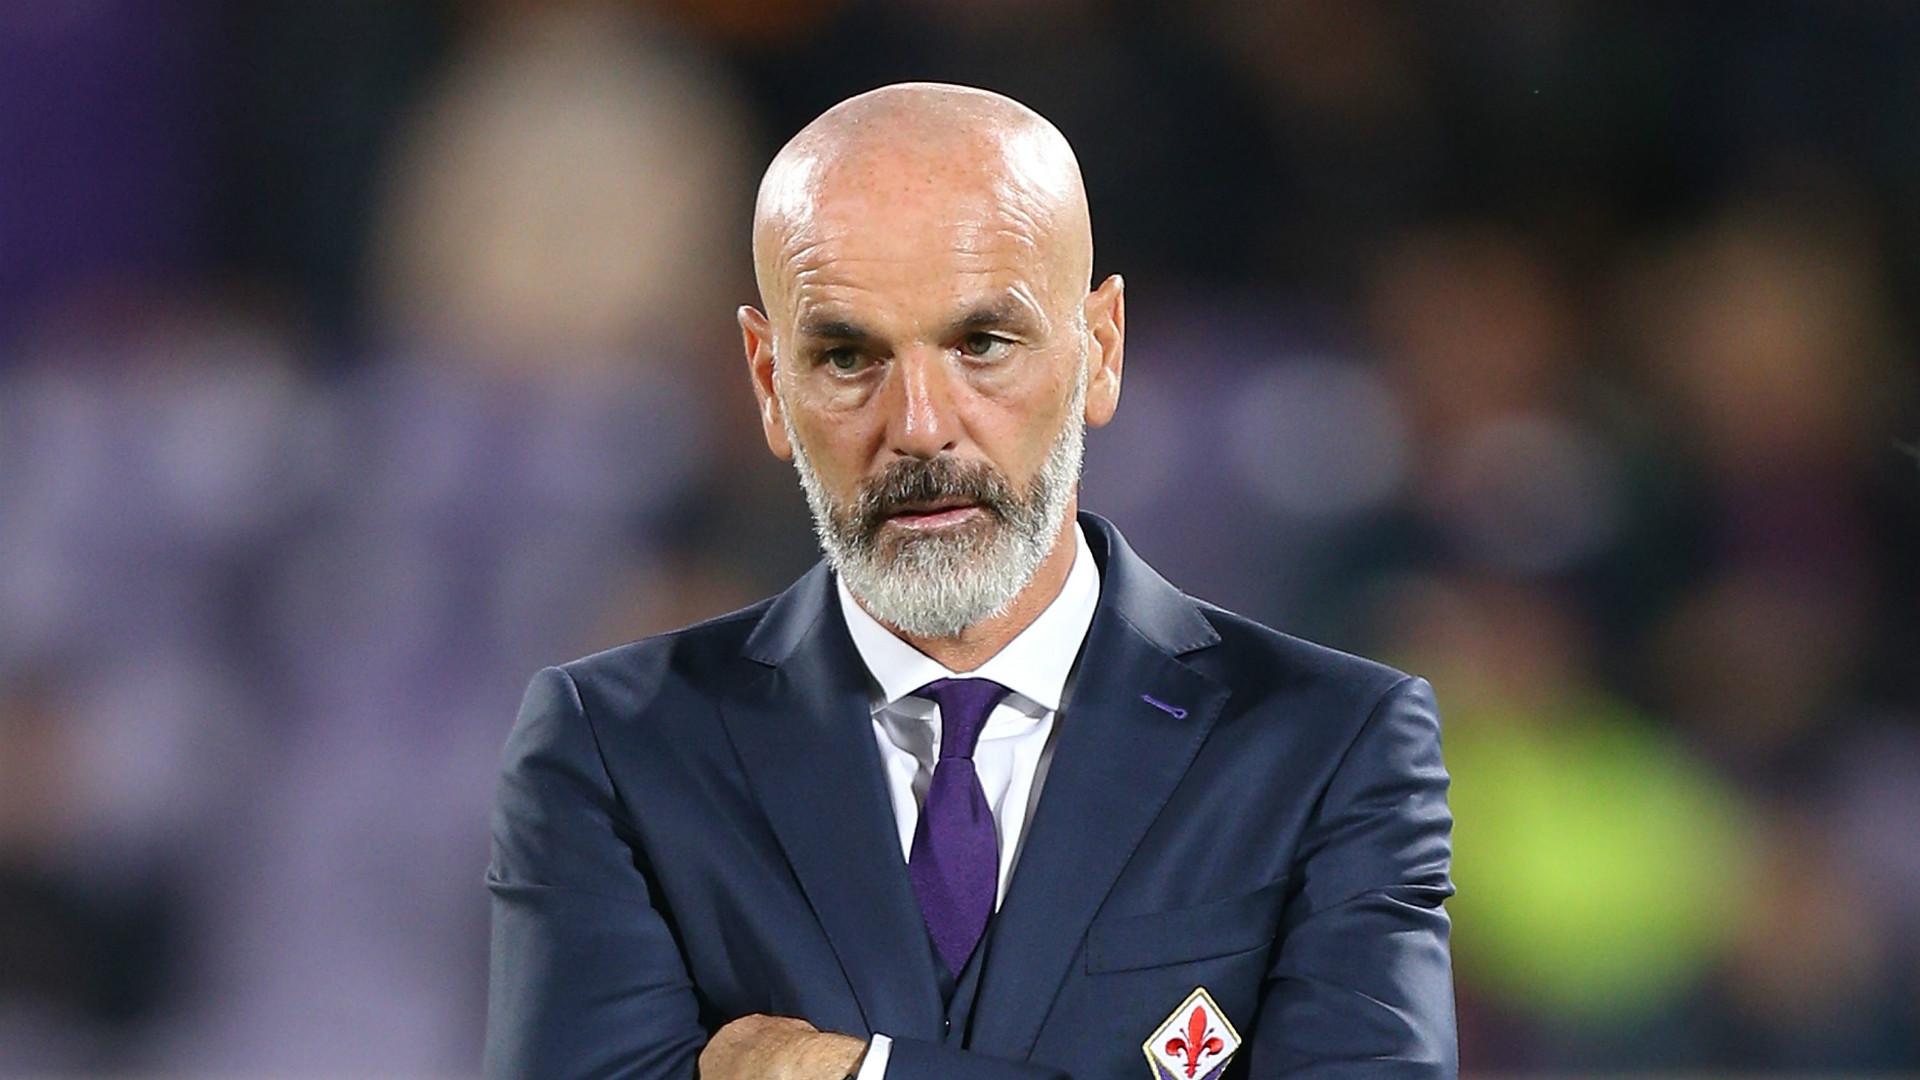 Fiorentina-Juventus, fischi per l'ex viola Bernardeschi. Poi segna ed esulta